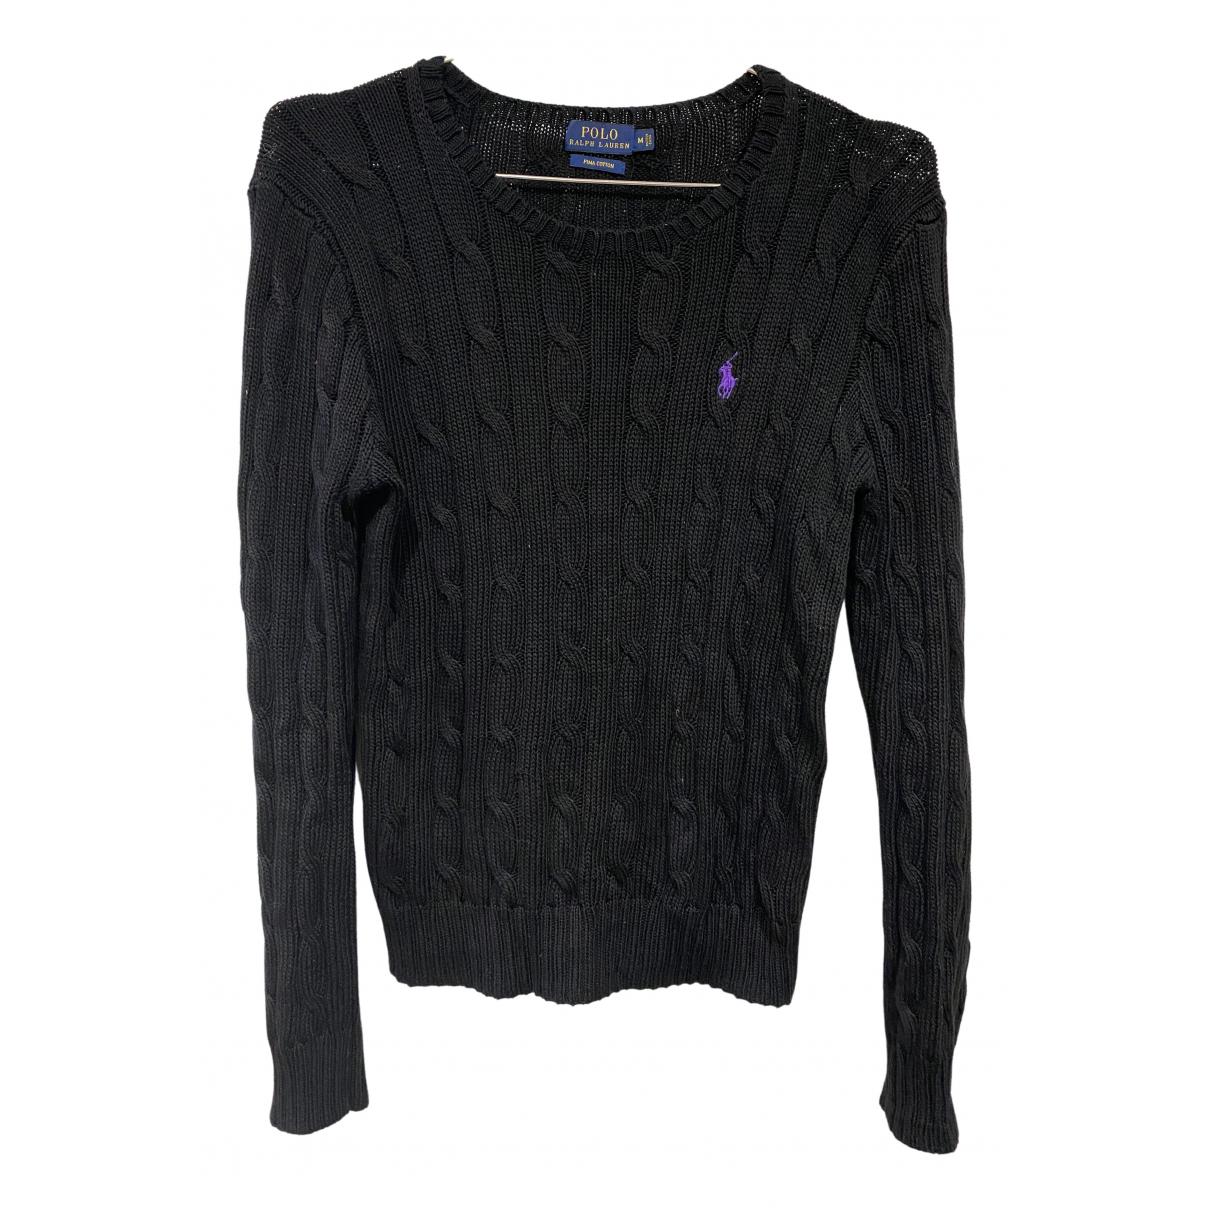 Polo Ralph Lauren \N Black Cotton  top for Women M International